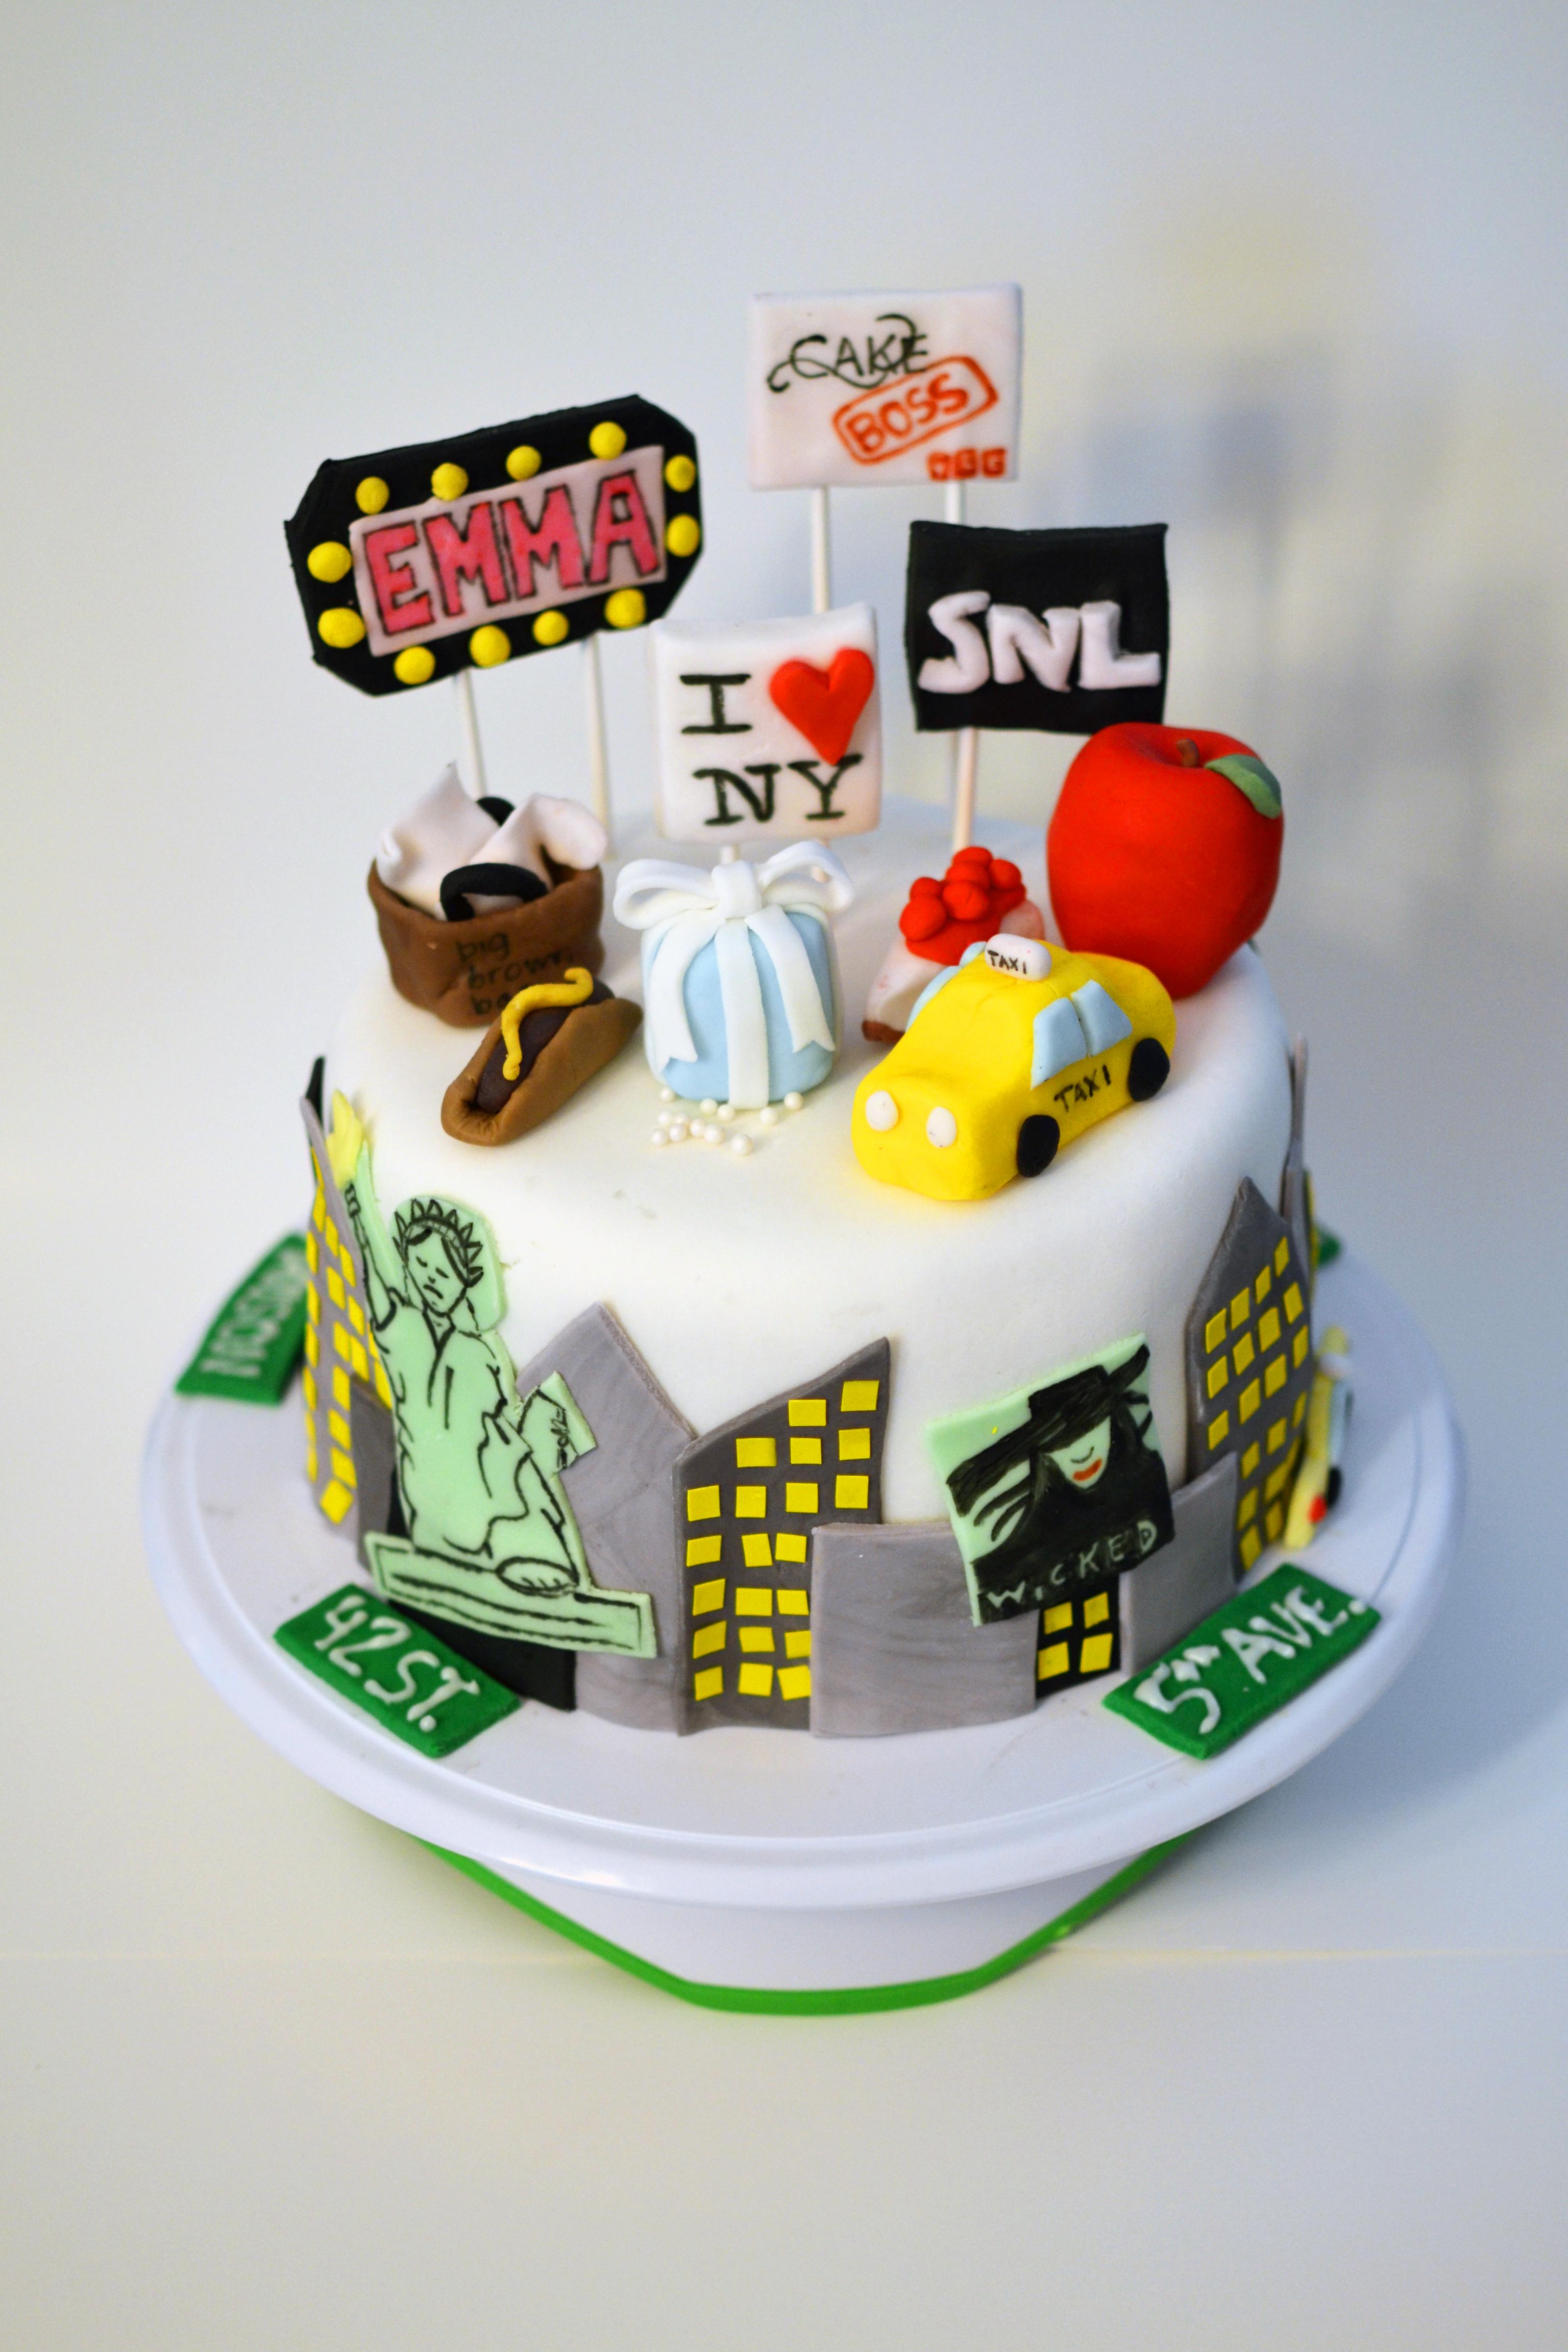 New York City Fondant Cake!